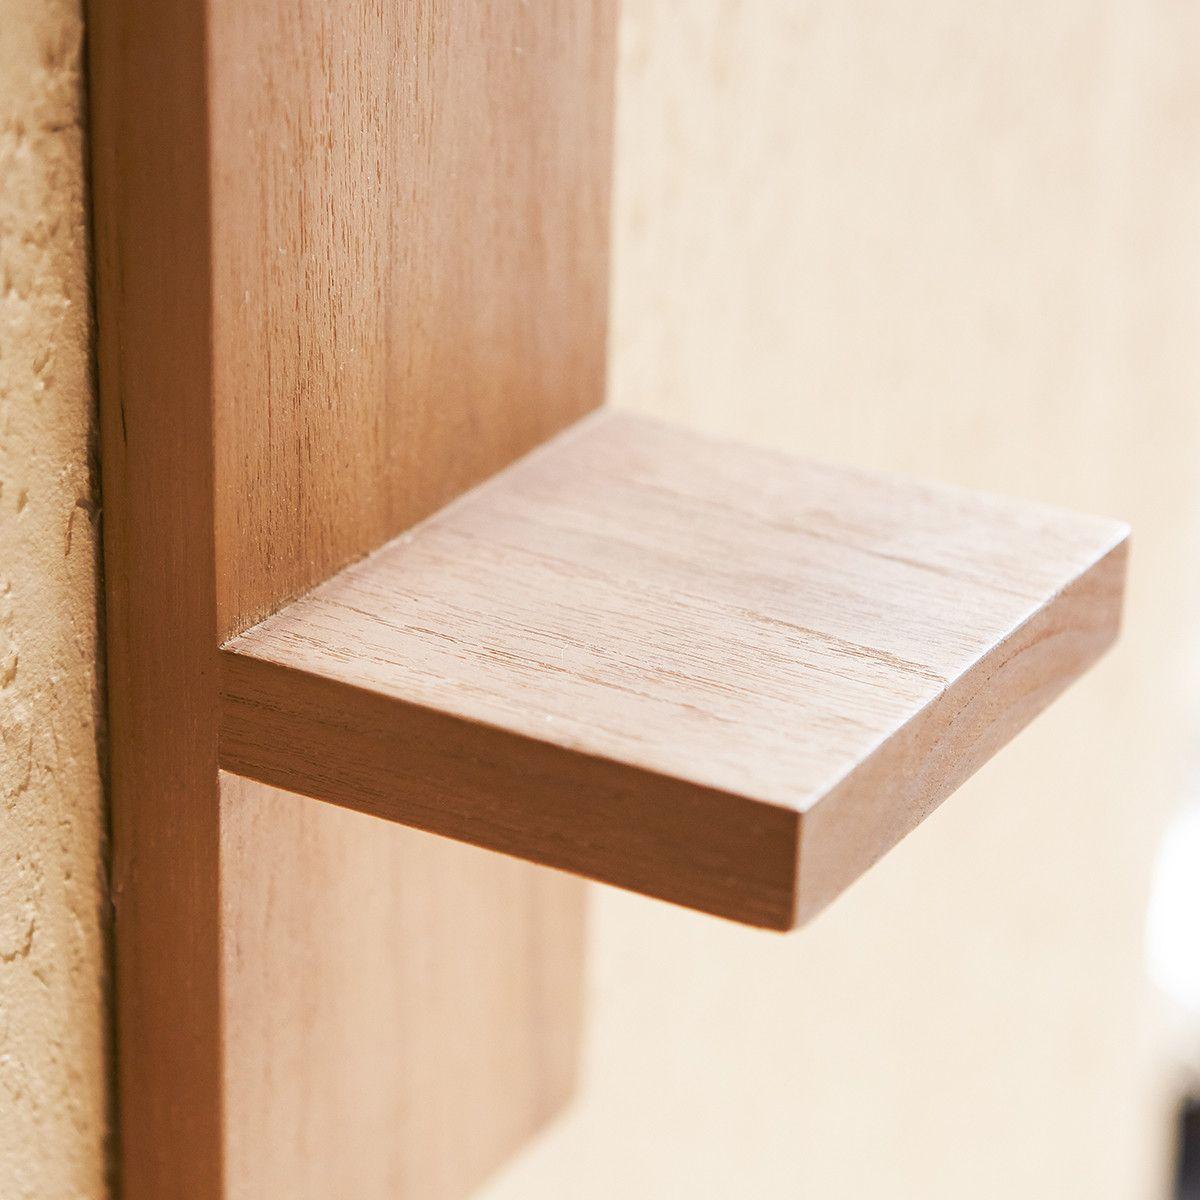 Teak Wood Vertical Bathroom Shelf Tikamoon In 2020 Teak Bathroom